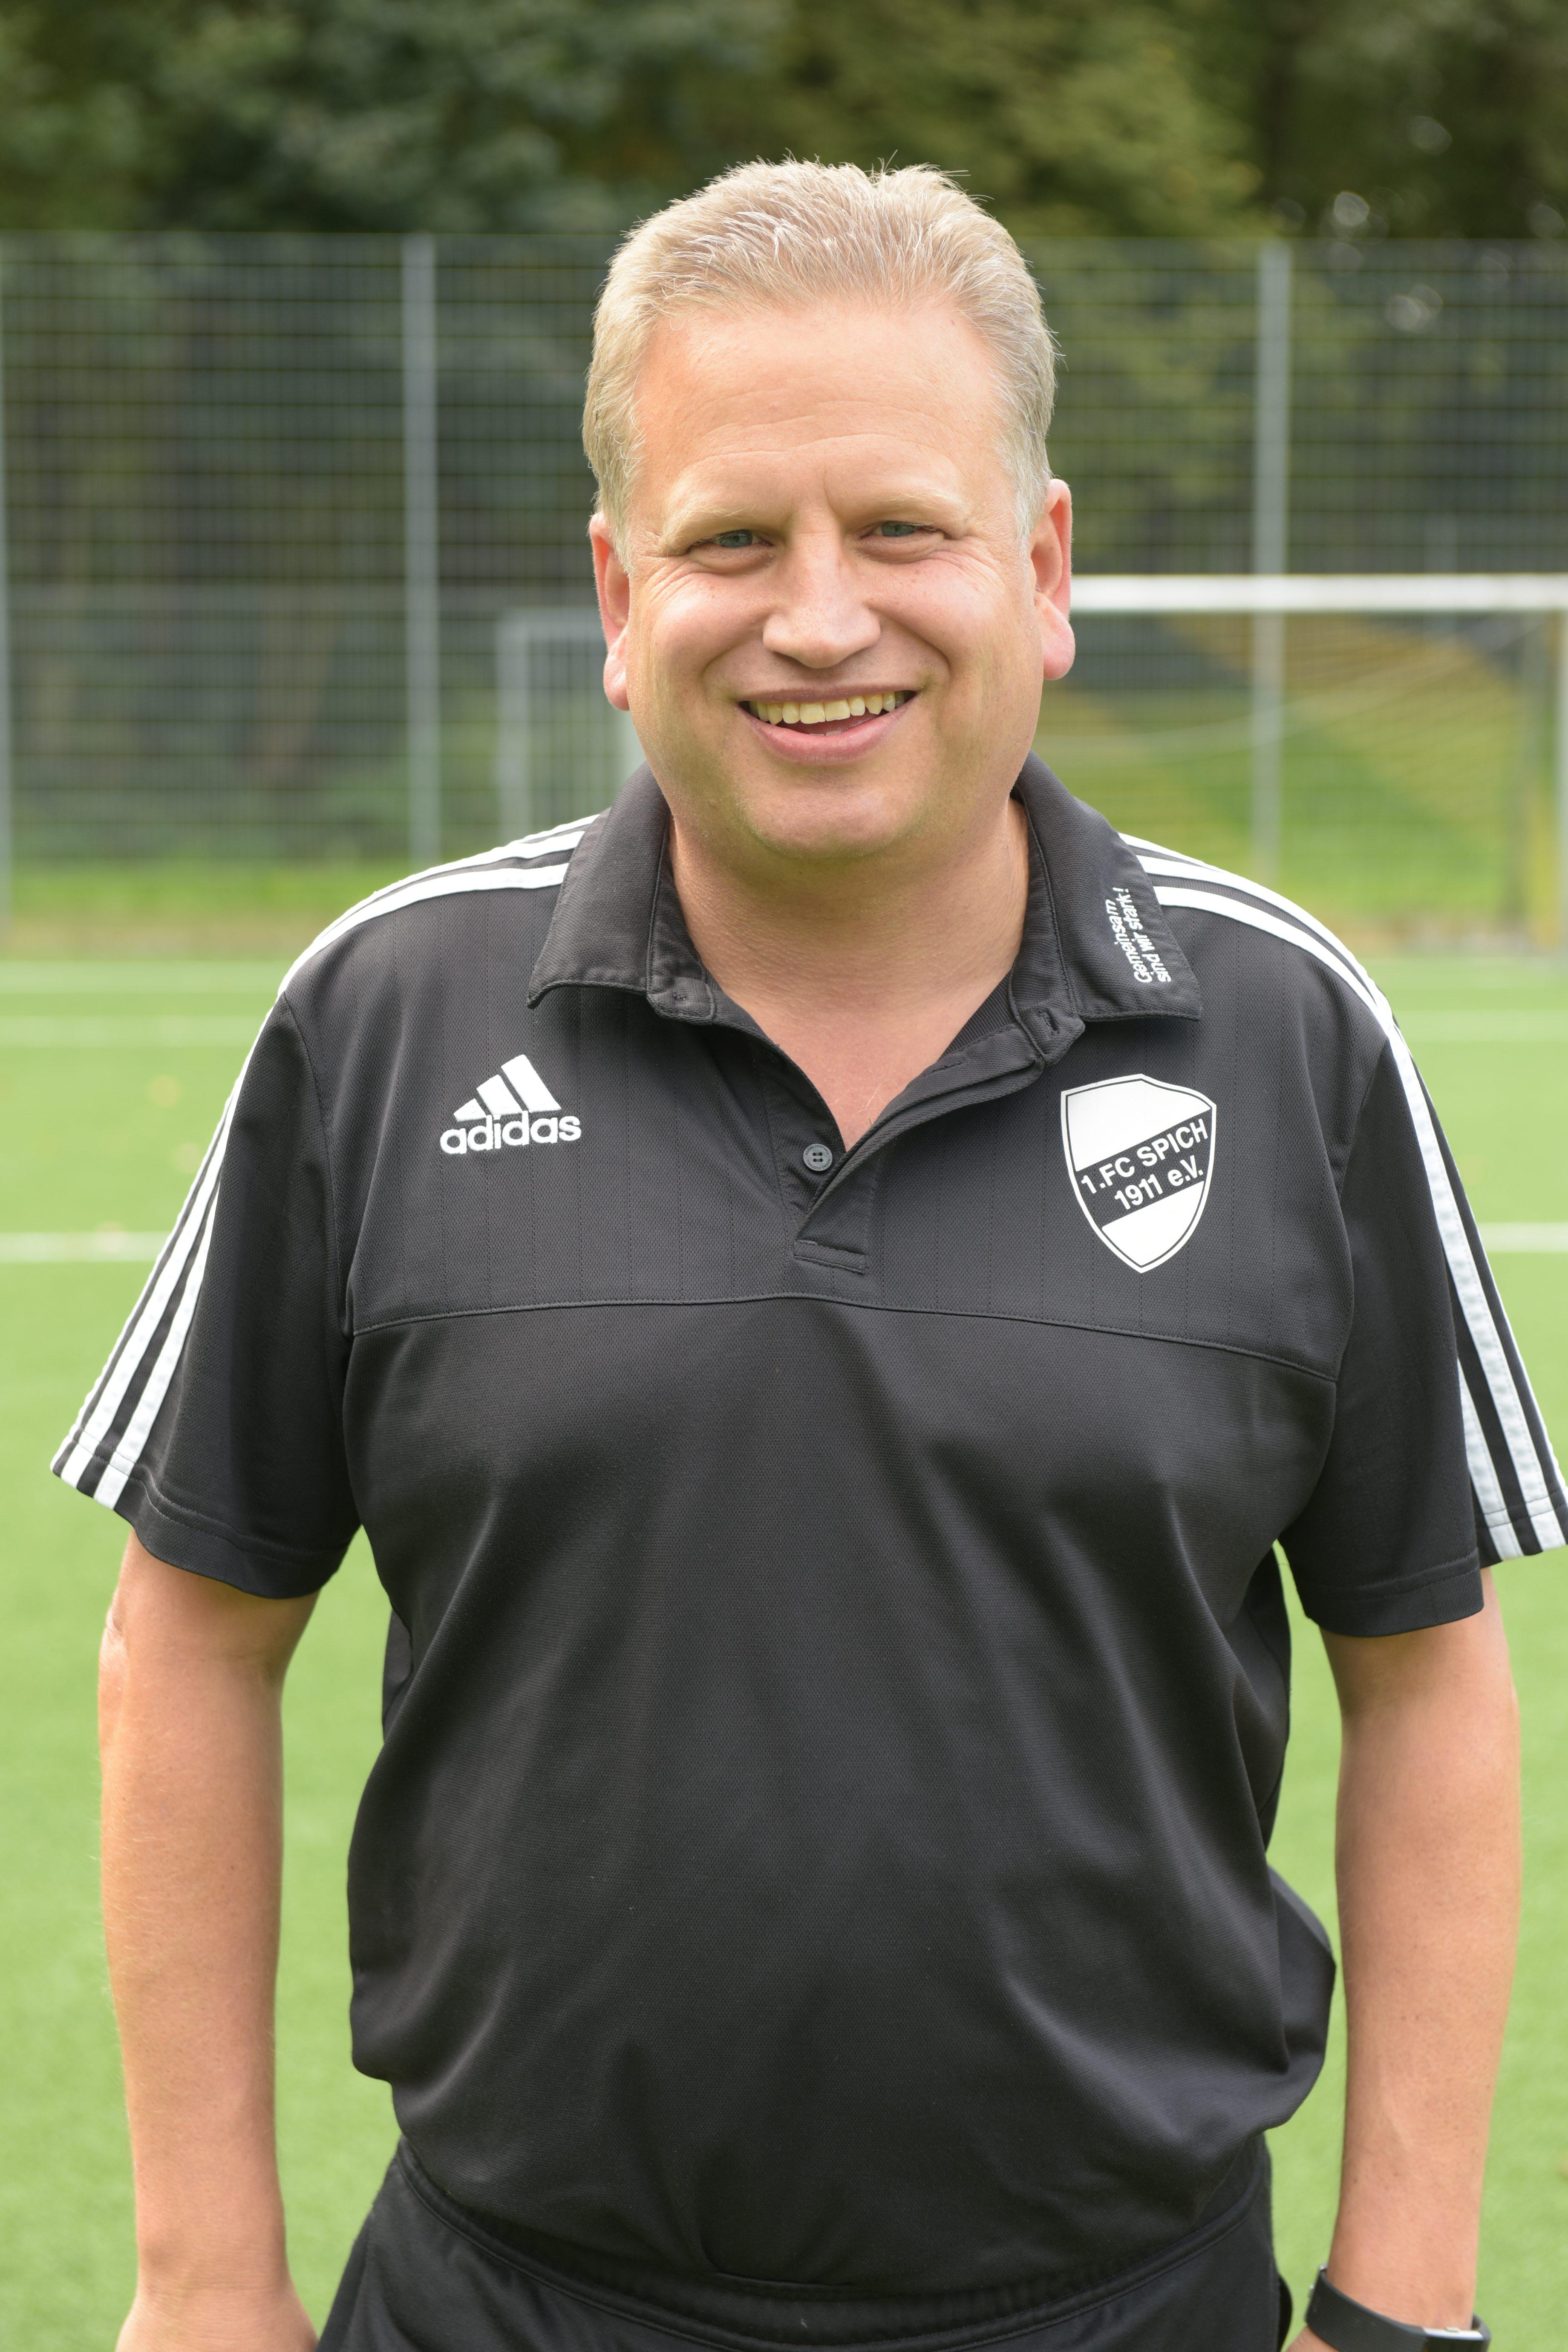 Jens Langhans